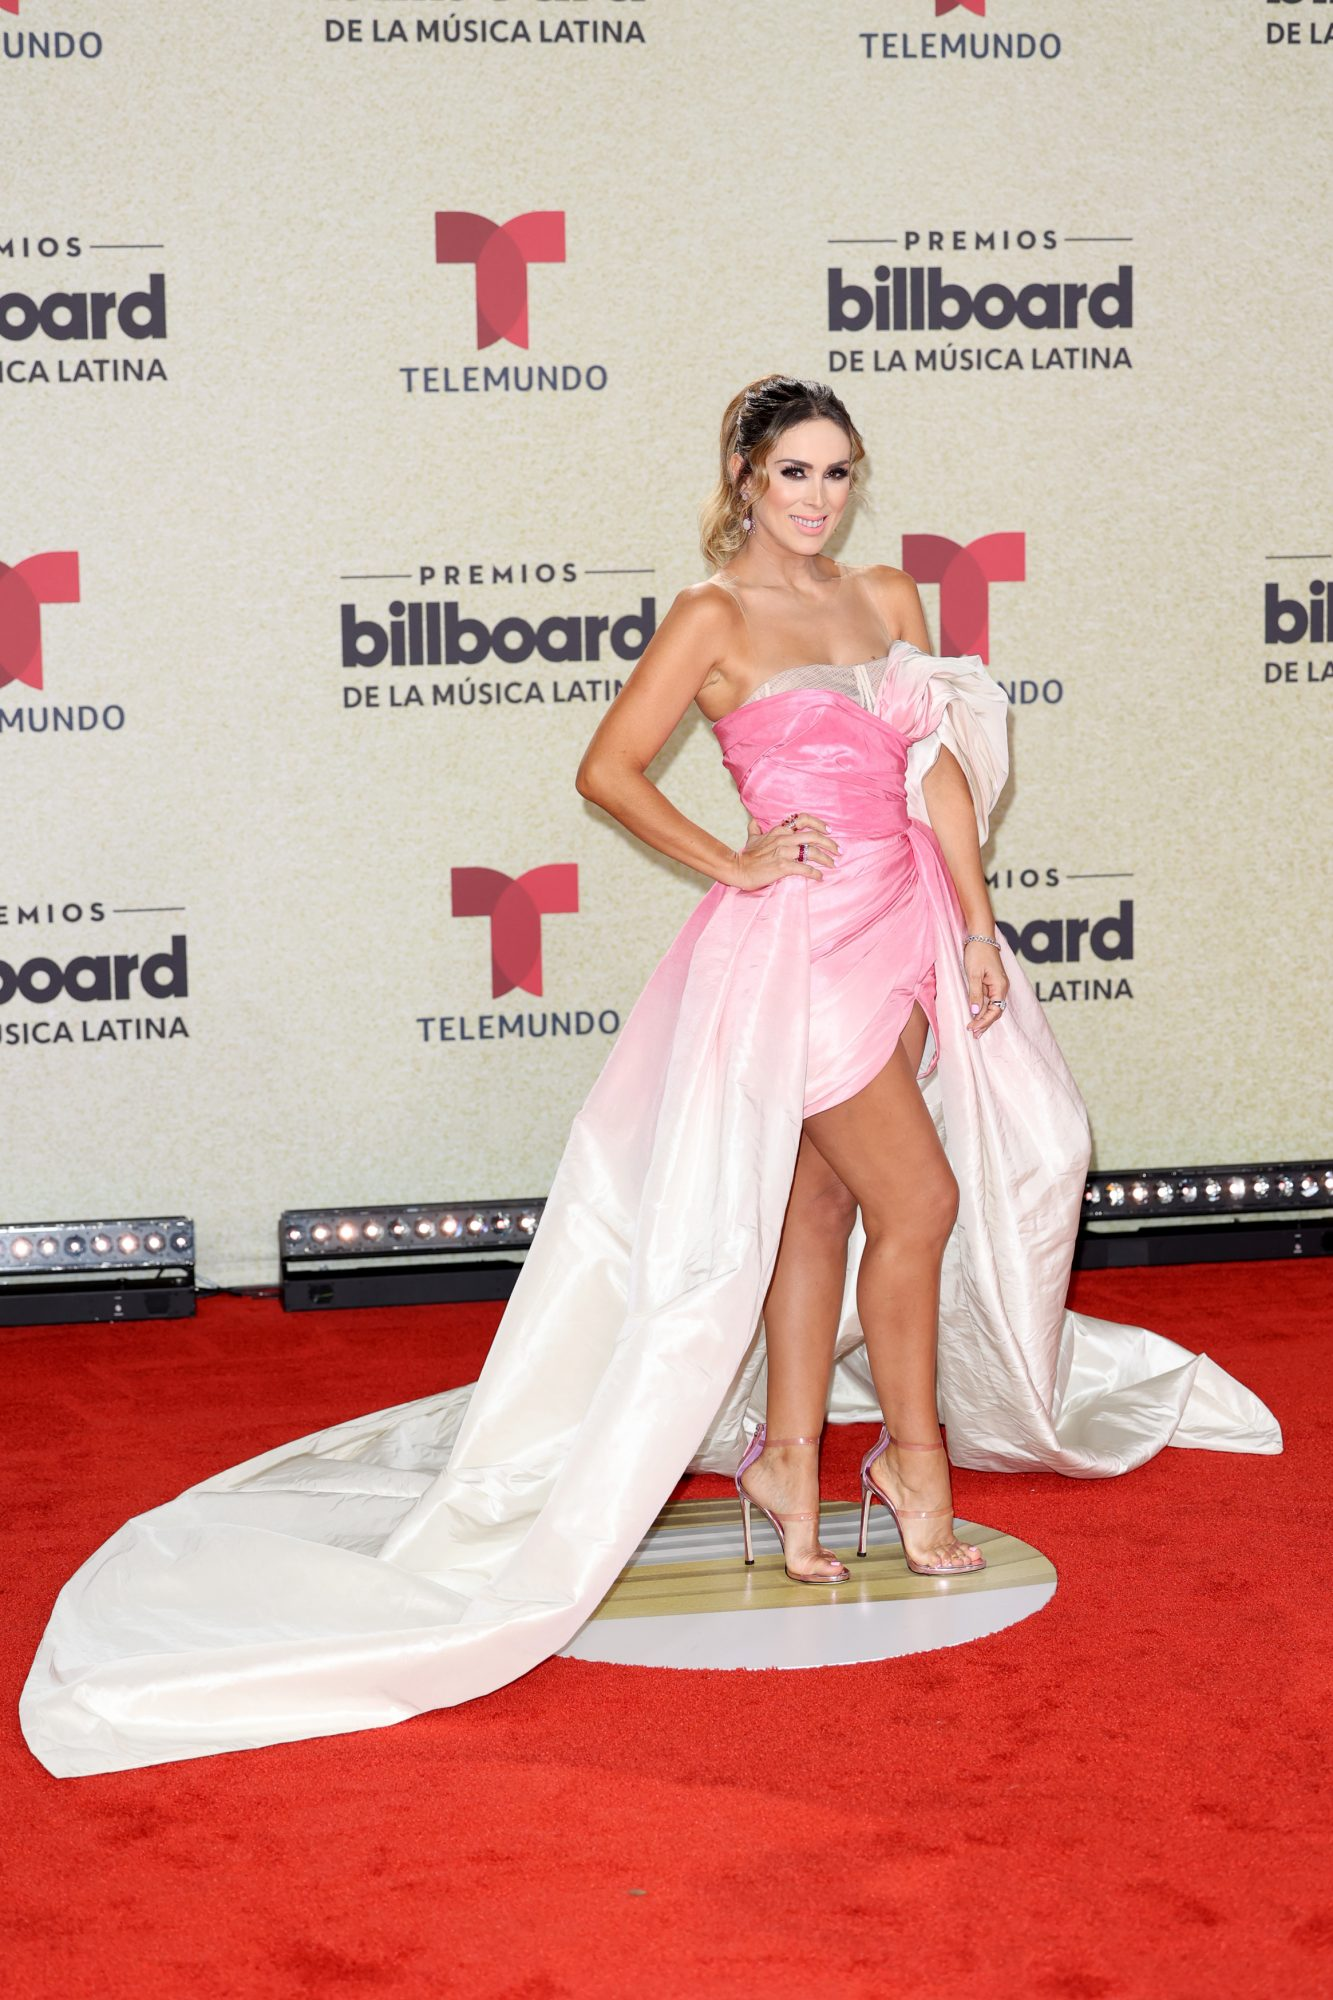 Jacqueline Bracamontes, Premios Billboard 2021